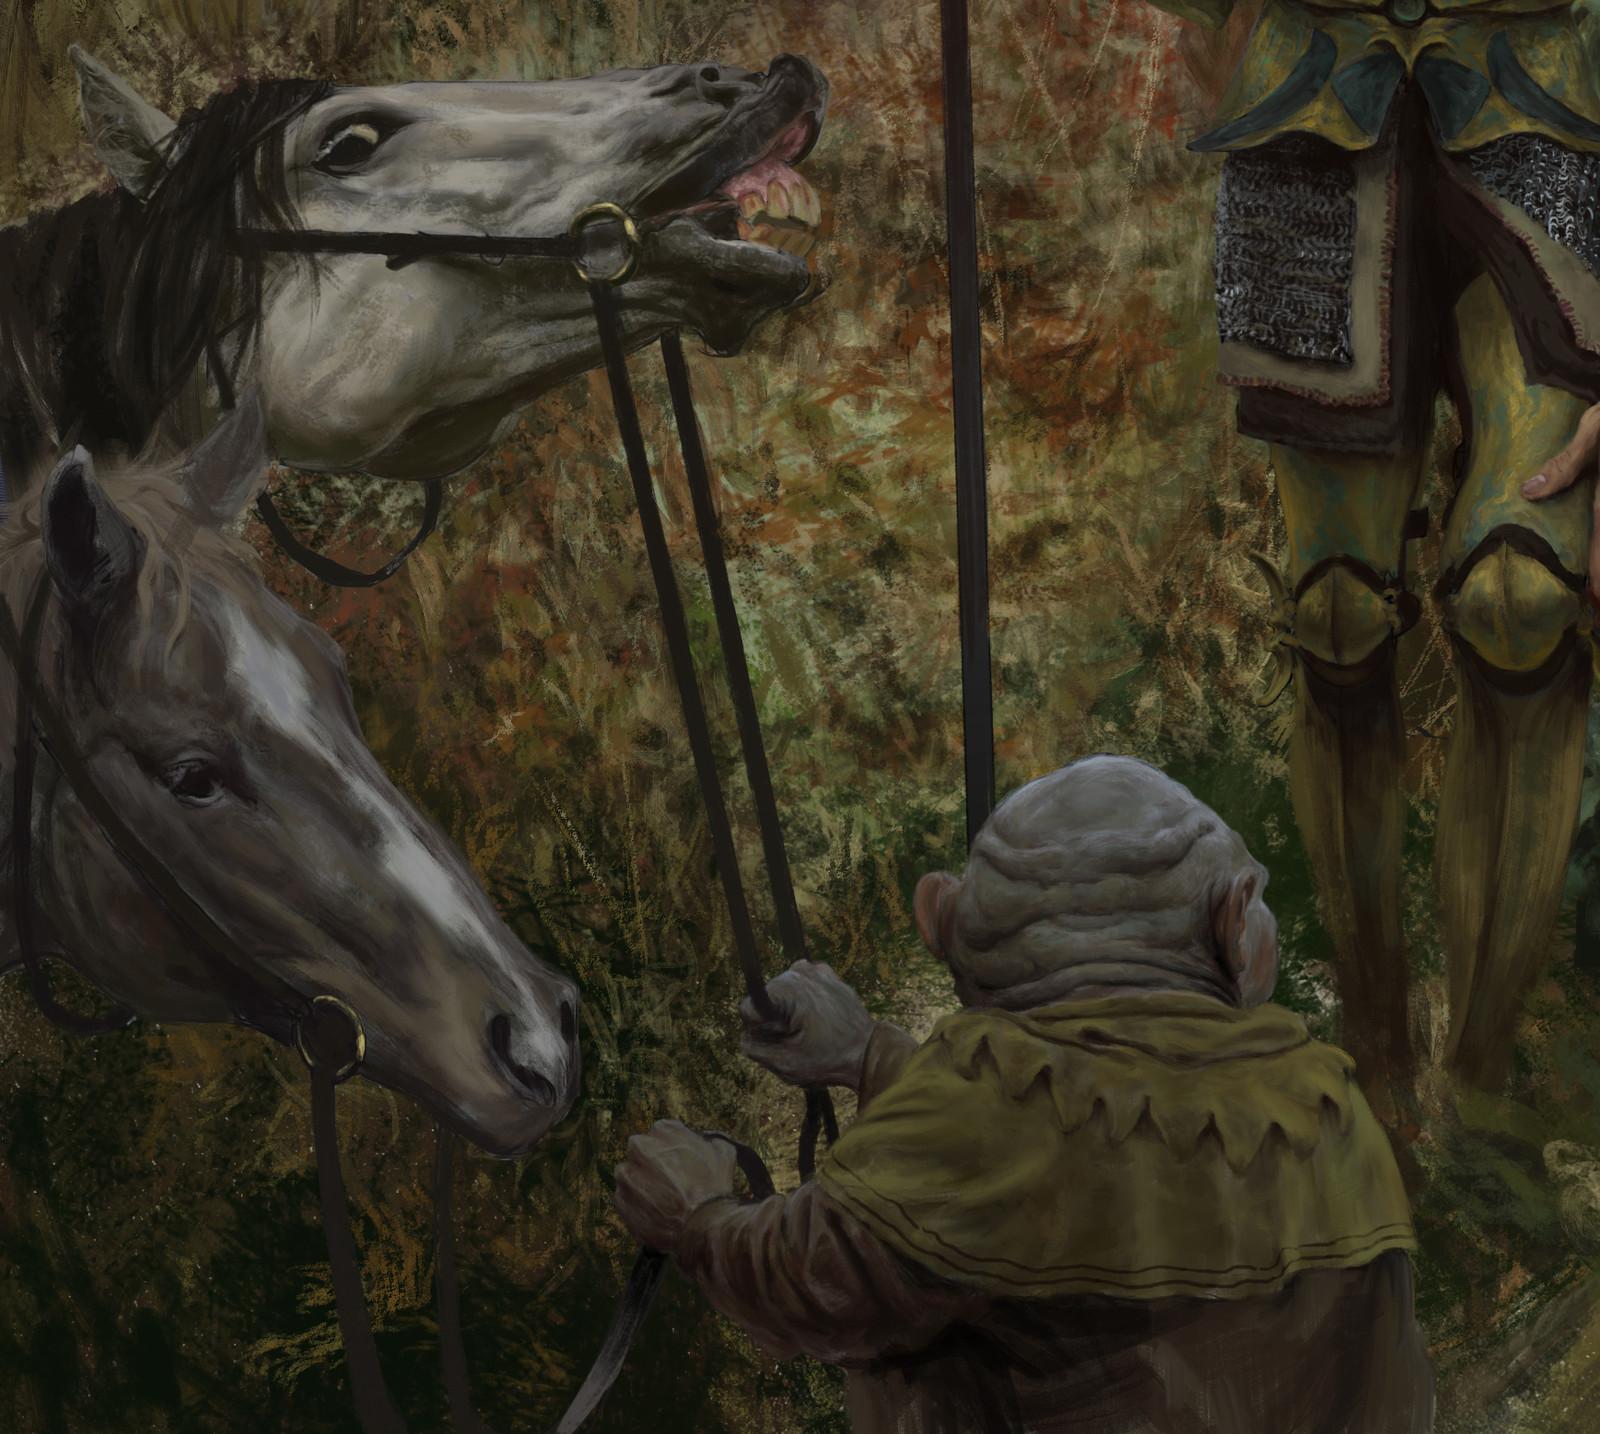 Mobin boy and horsies